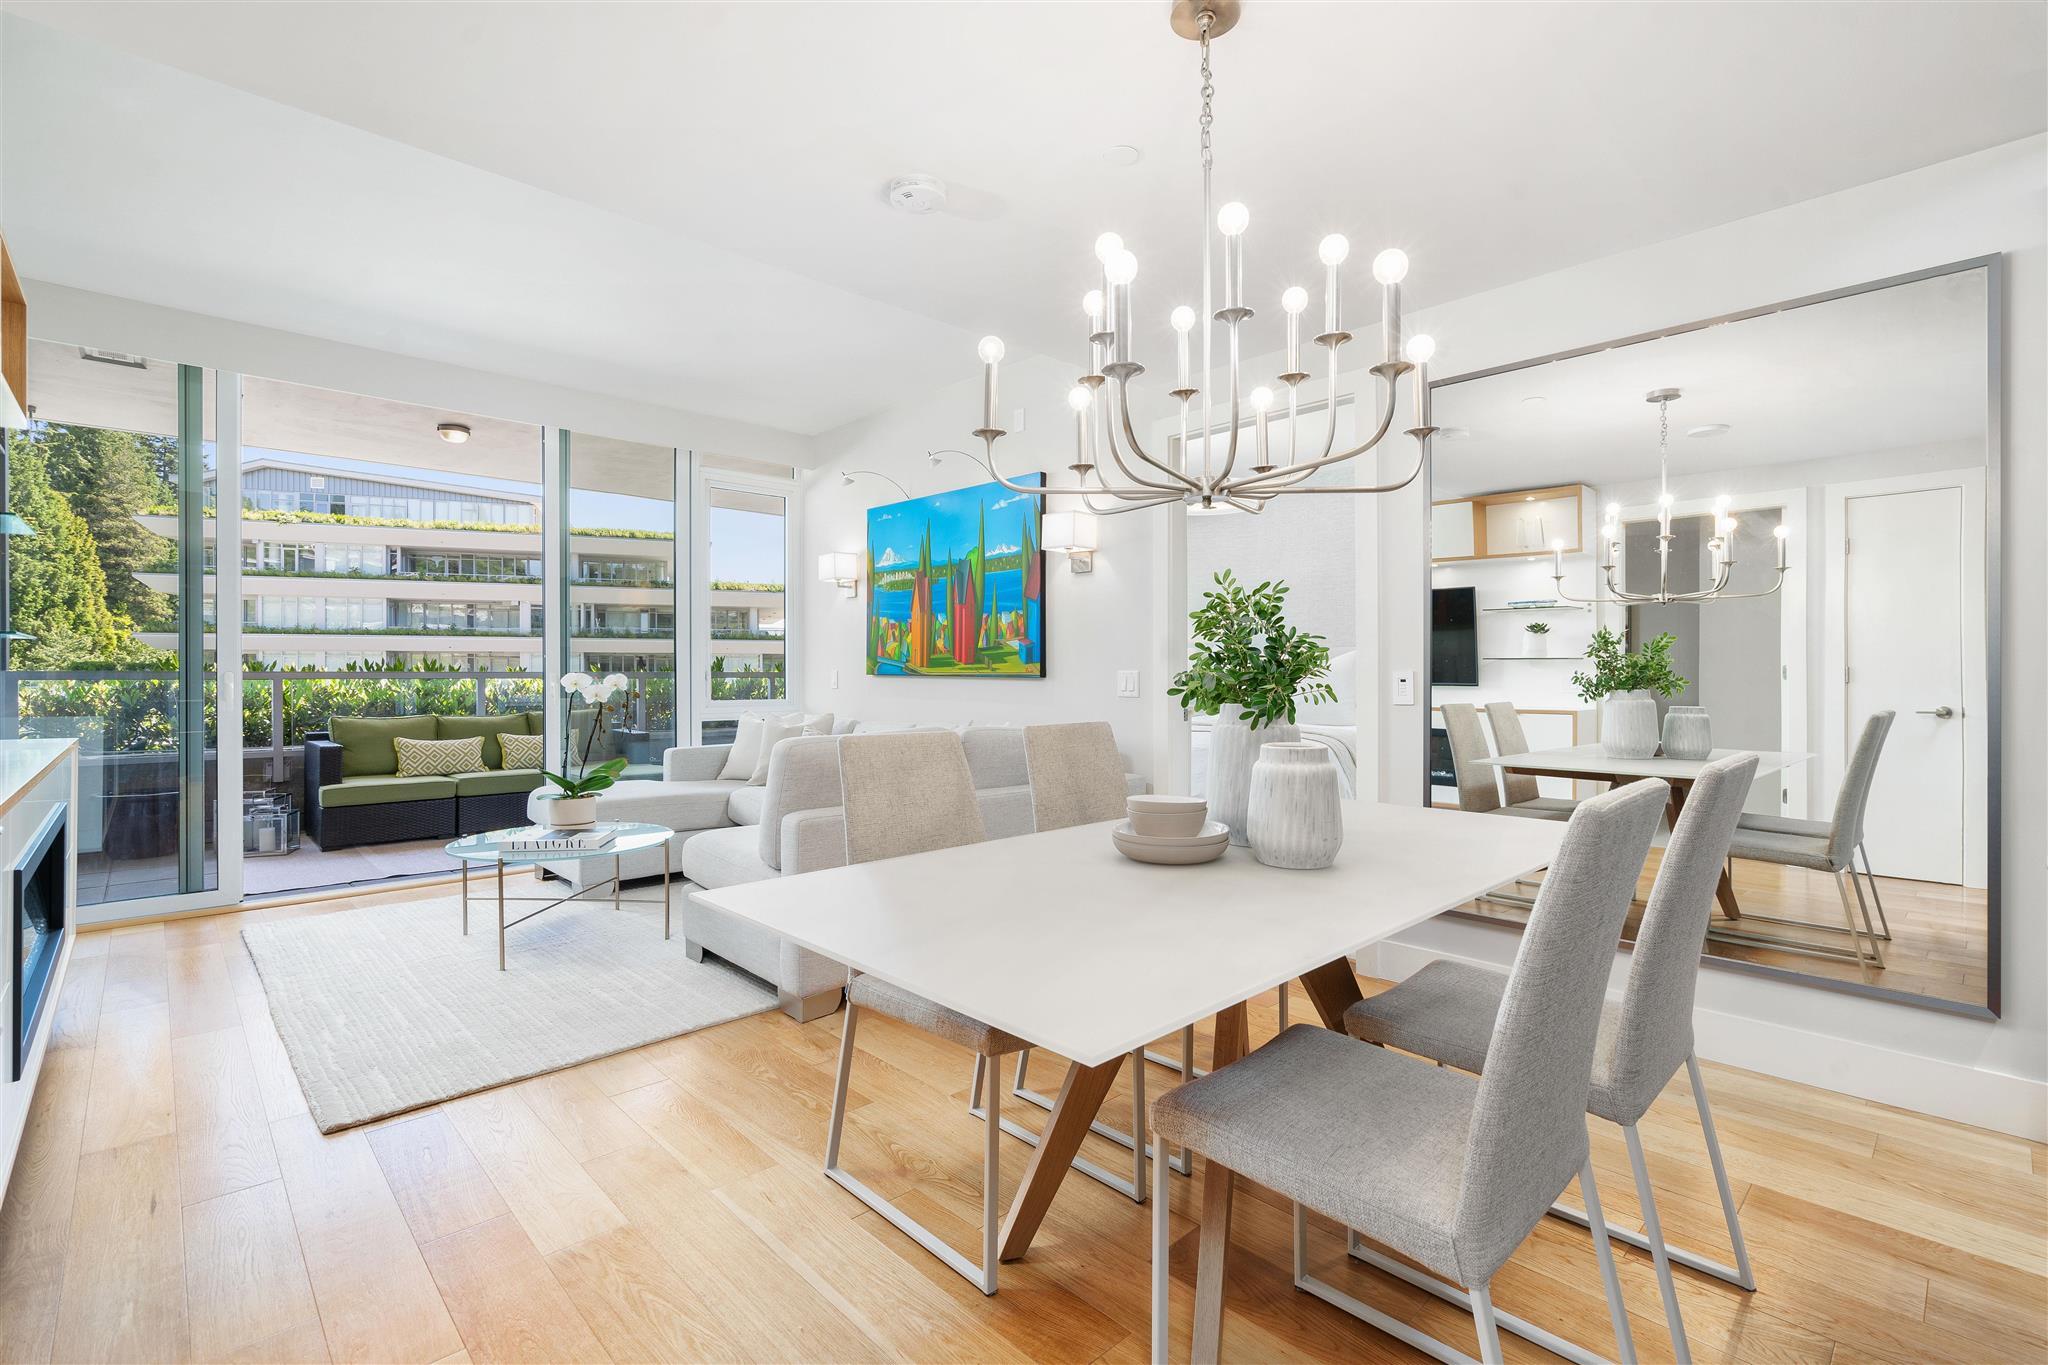 402 866 ARTHUR ERICKSON PLACE - Park Royal Apartment/Condo for sale, 2 Bedrooms (R2599460)